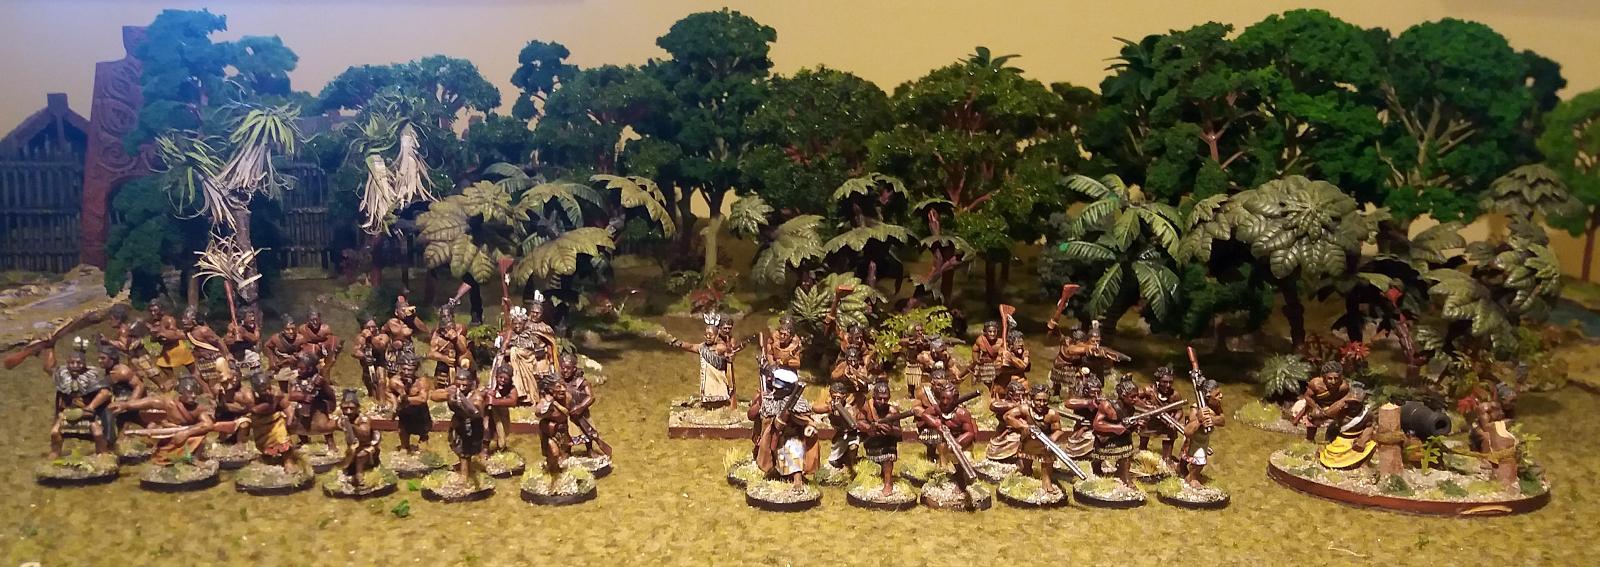 New Zealand's 19th-century wars - New Zealand's 19th-century wars ...